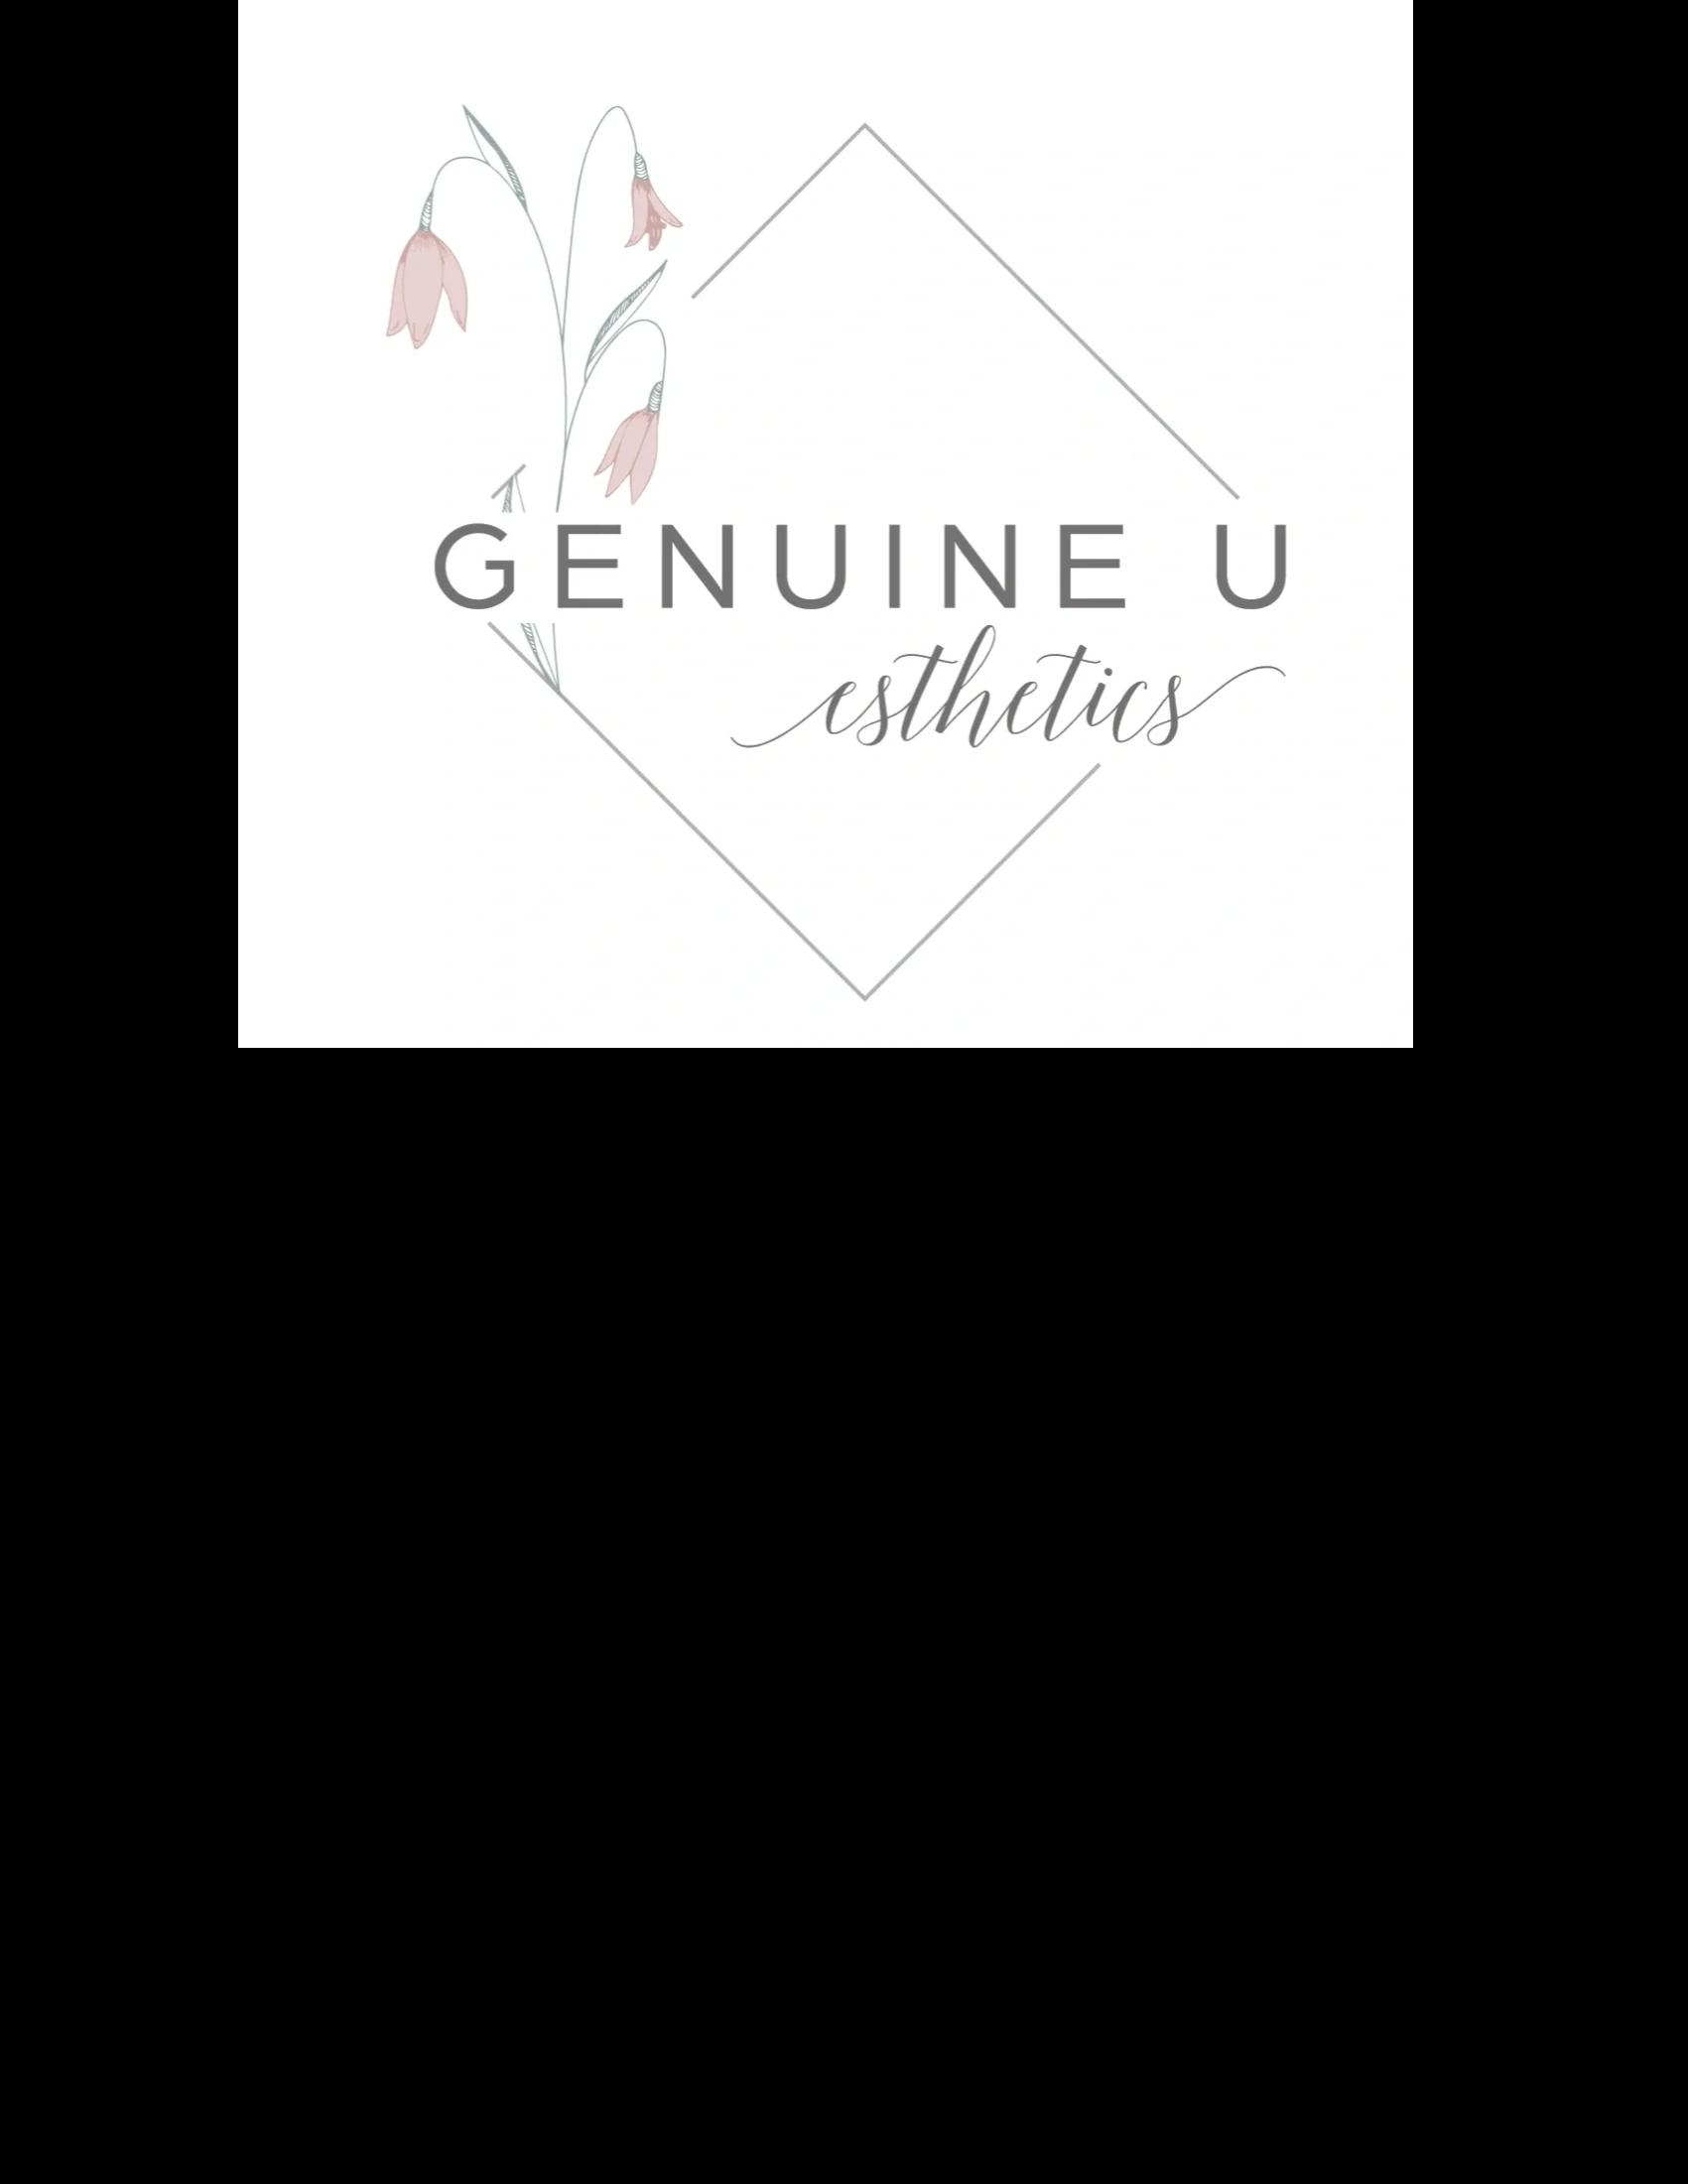 Genuine U Esthetics logo